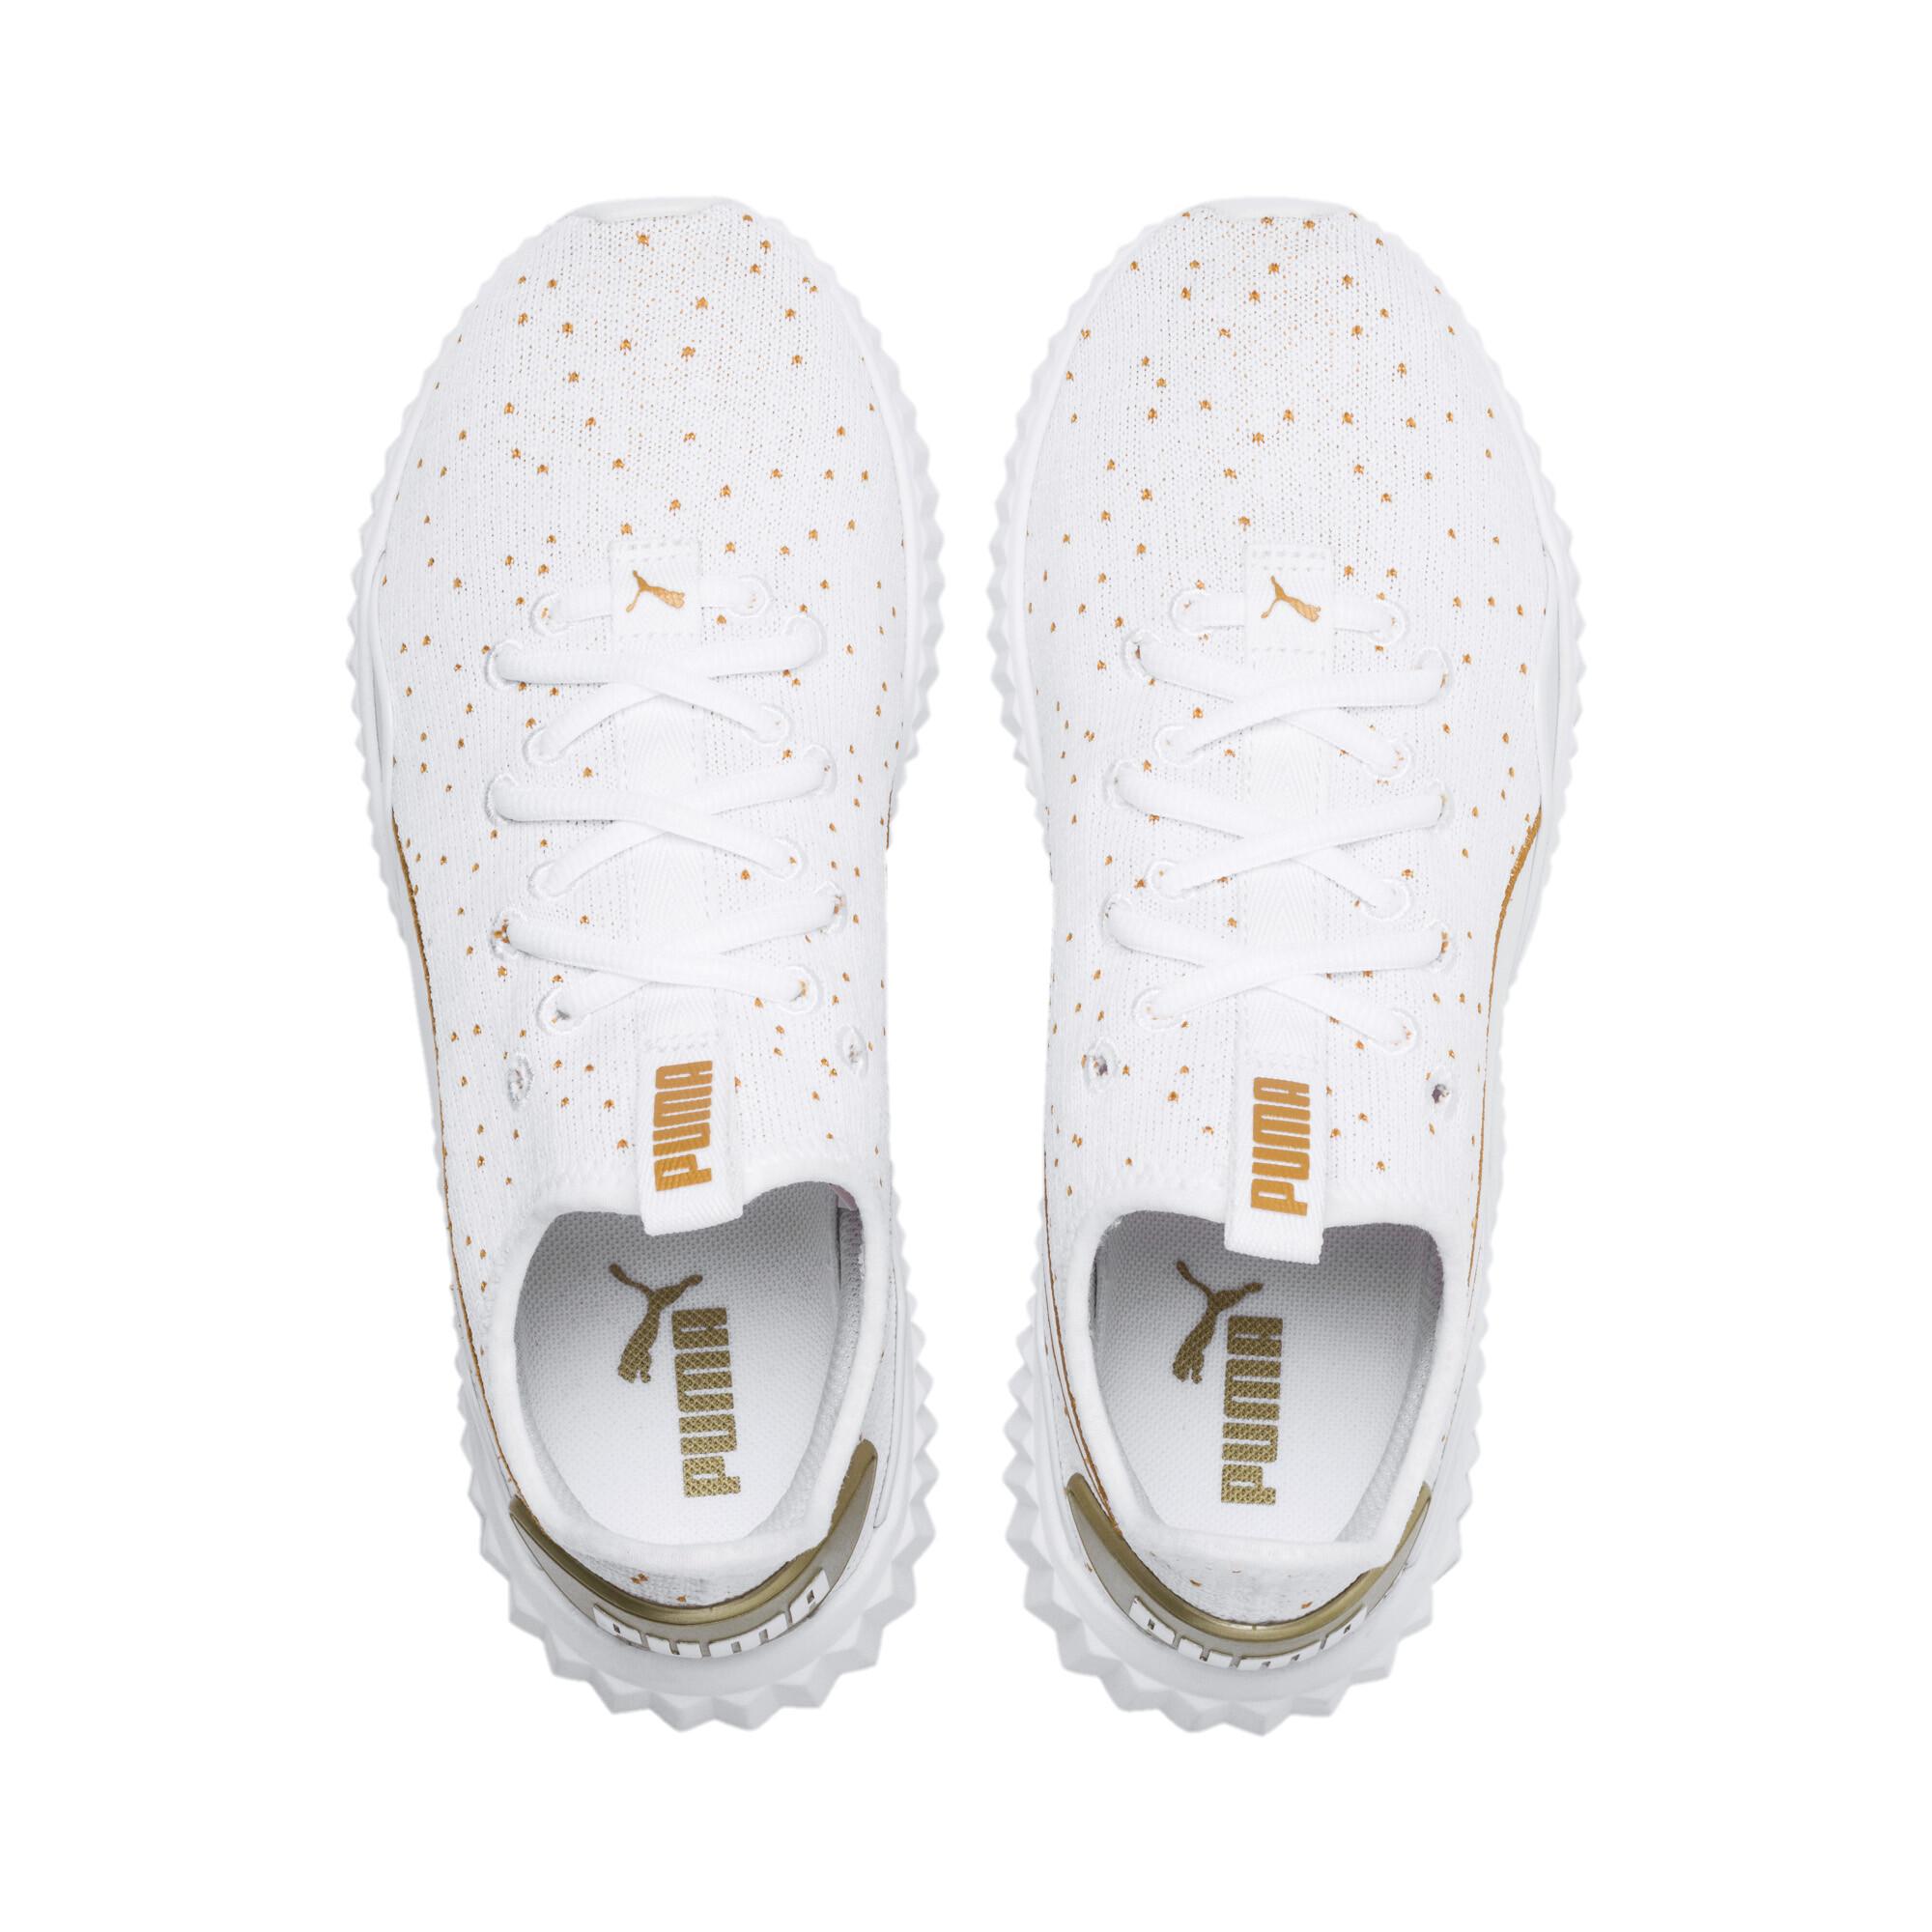 PUMA-Defy-Speckle-Women-s-Training-Shoes-Women-Shoe-Training thumbnail 7